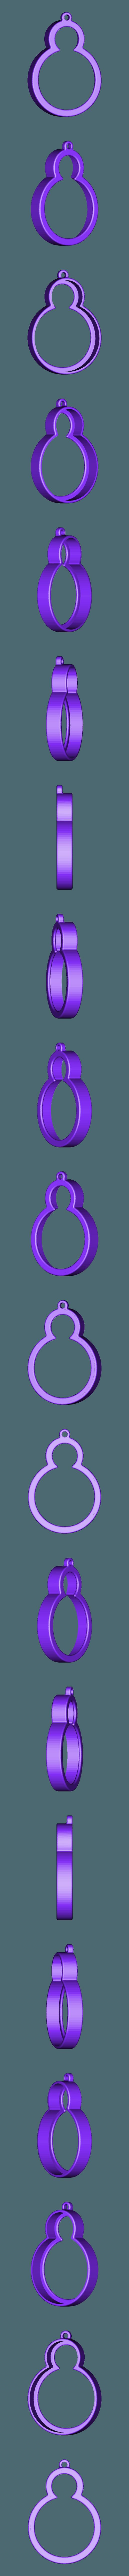 Gear_Key_Chain_Top.stl Download free STL file TOYOTA GEAR KEY CHAIN • 3D printer template, GREGCAR_3DPrinting